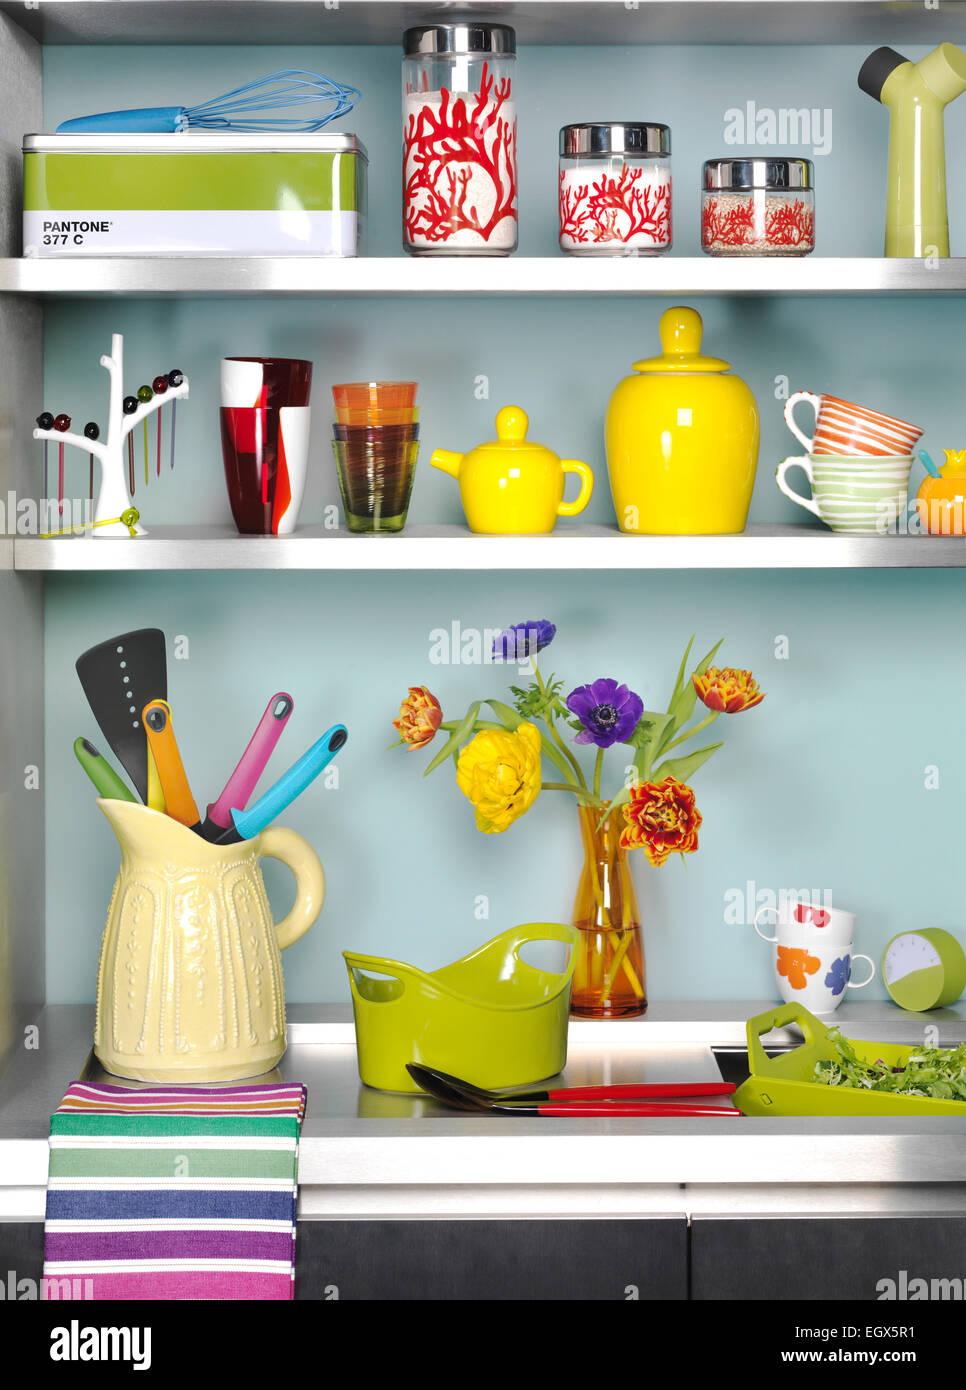 Interiors Modern Kitchens Shelving Stock Photos & Interiors Modern ...